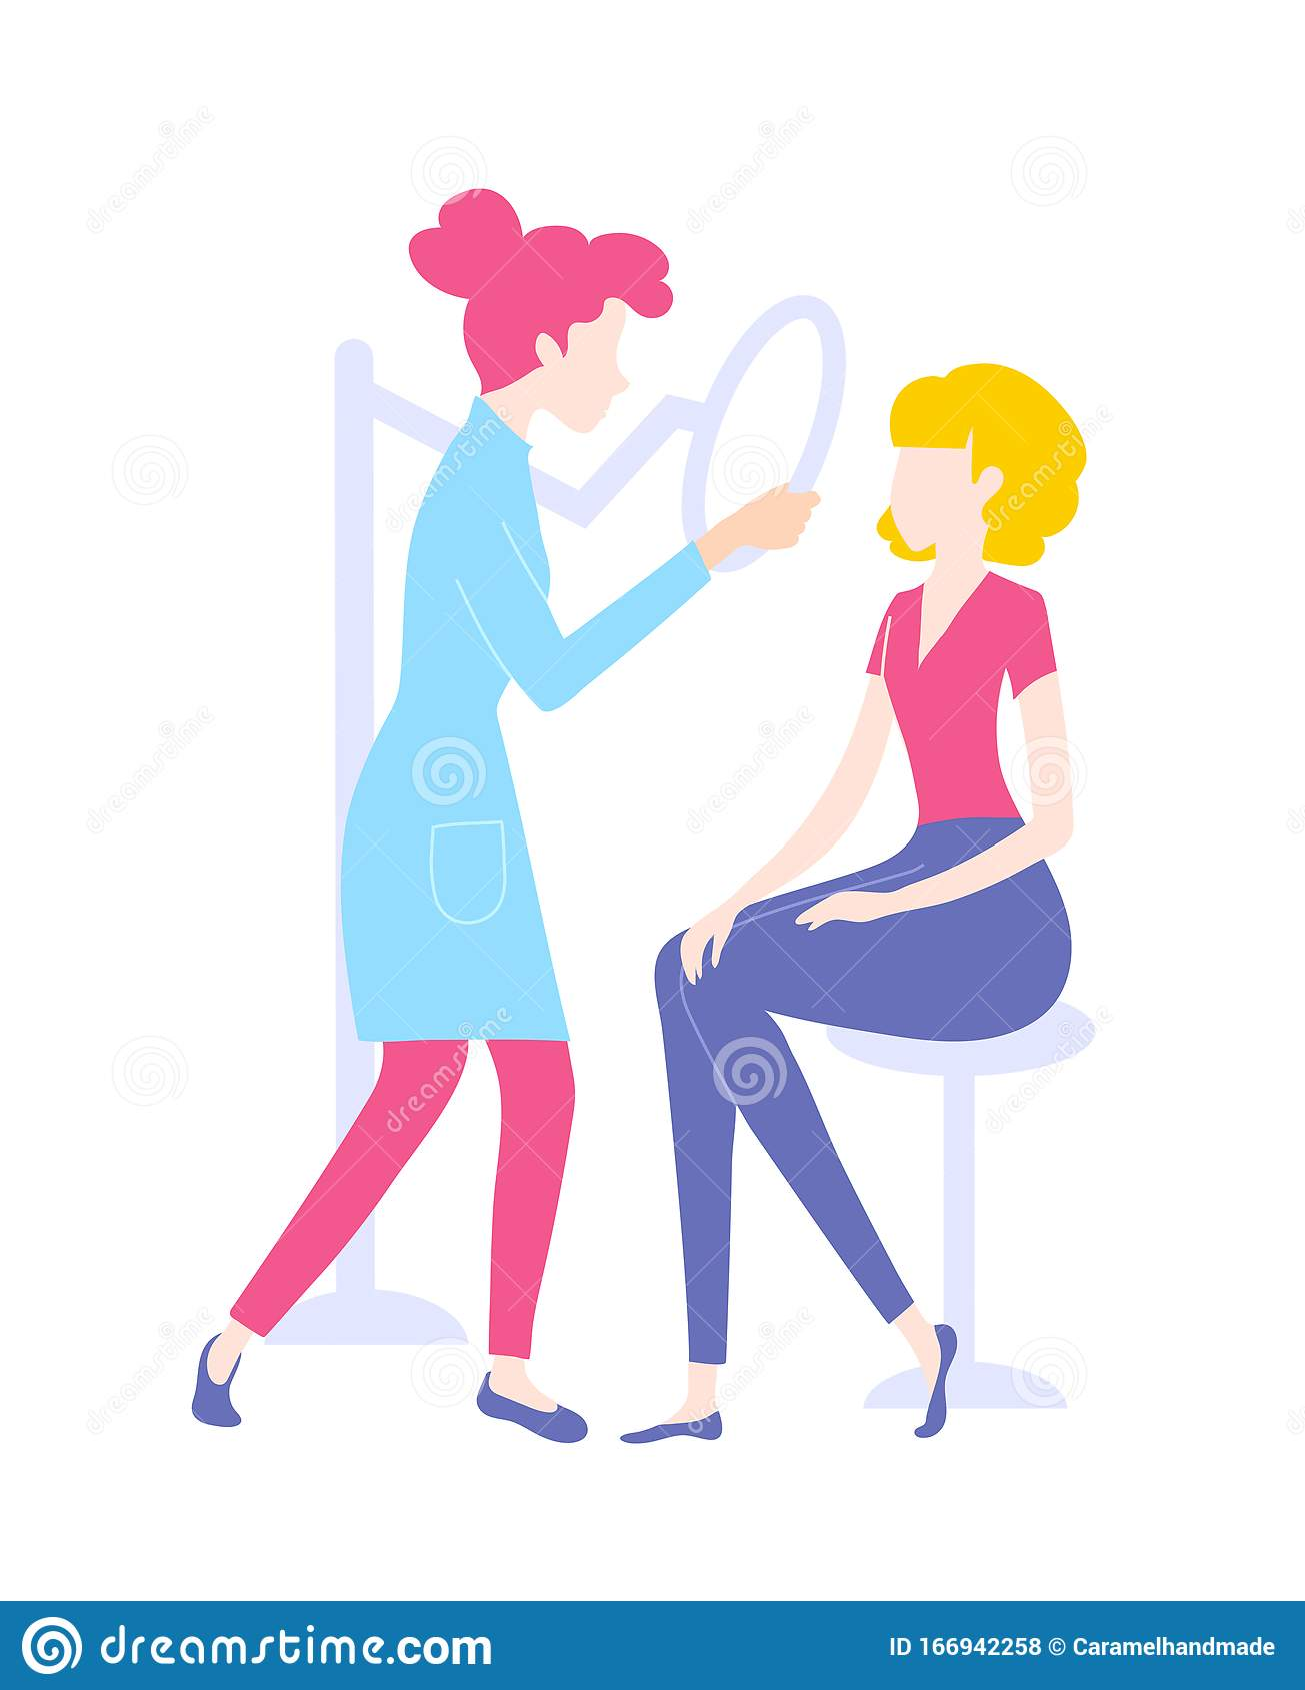 Dermatologist Clipart : dermatologist, clipart, Checking, Dermatologist, Stock, Illustrations, Illustrations,, Vectors, Clipart, Dreamstime